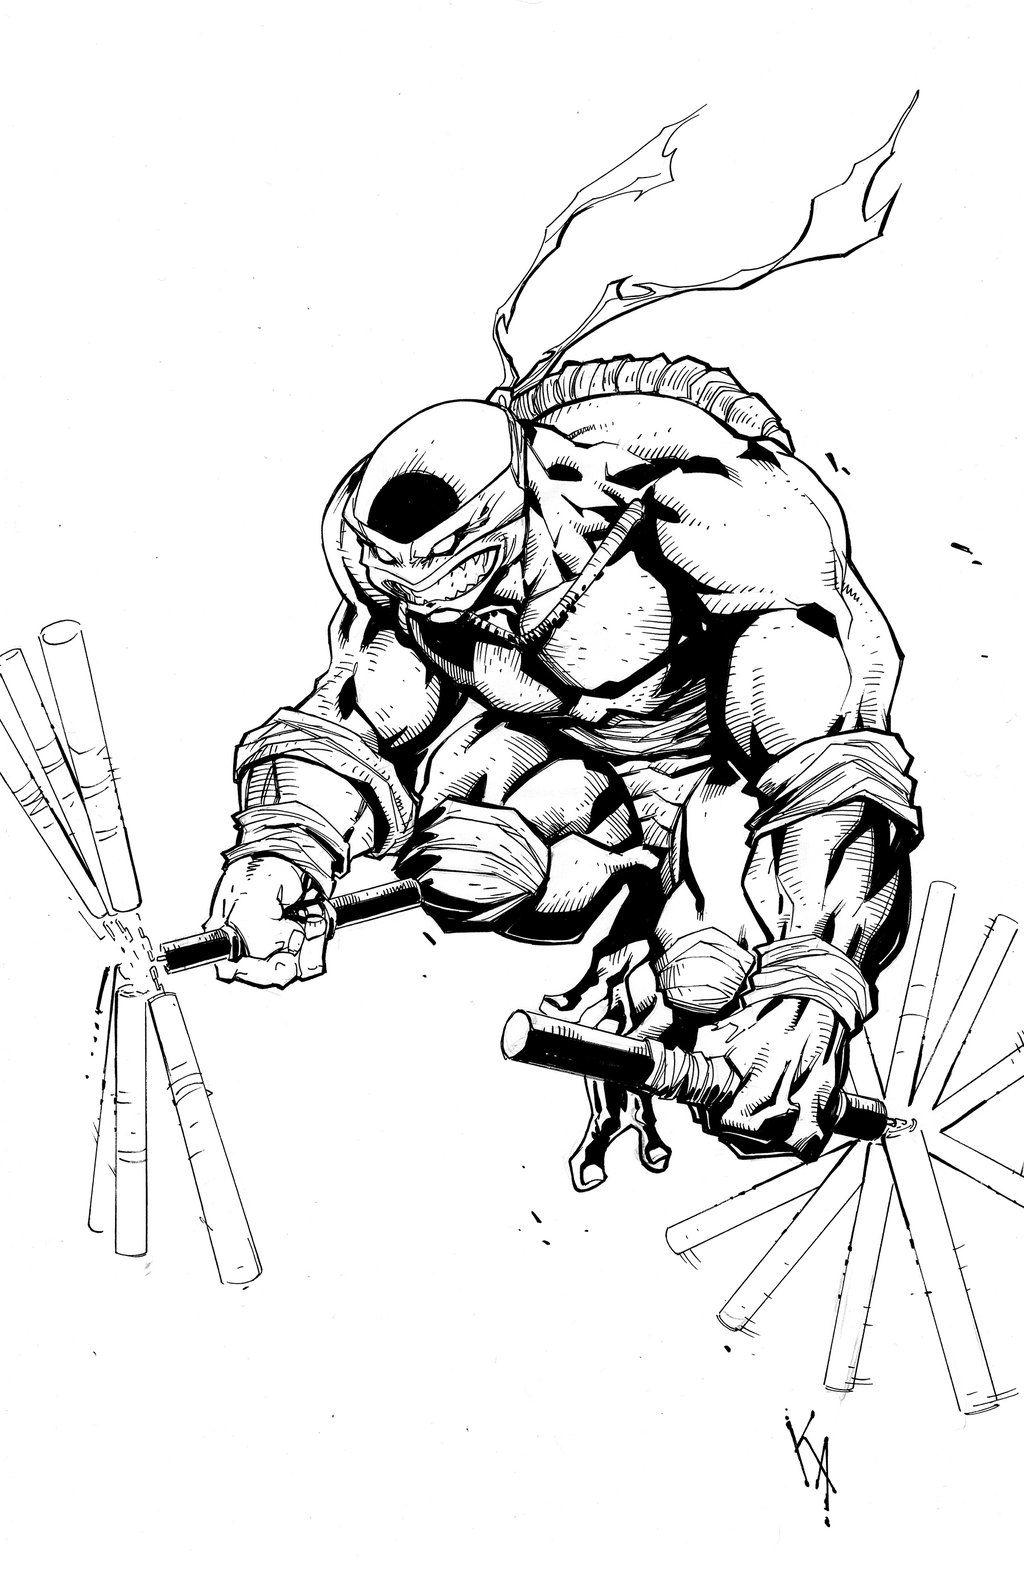 How To Draw Ninja Turtles Pencil Cartoon Black And White